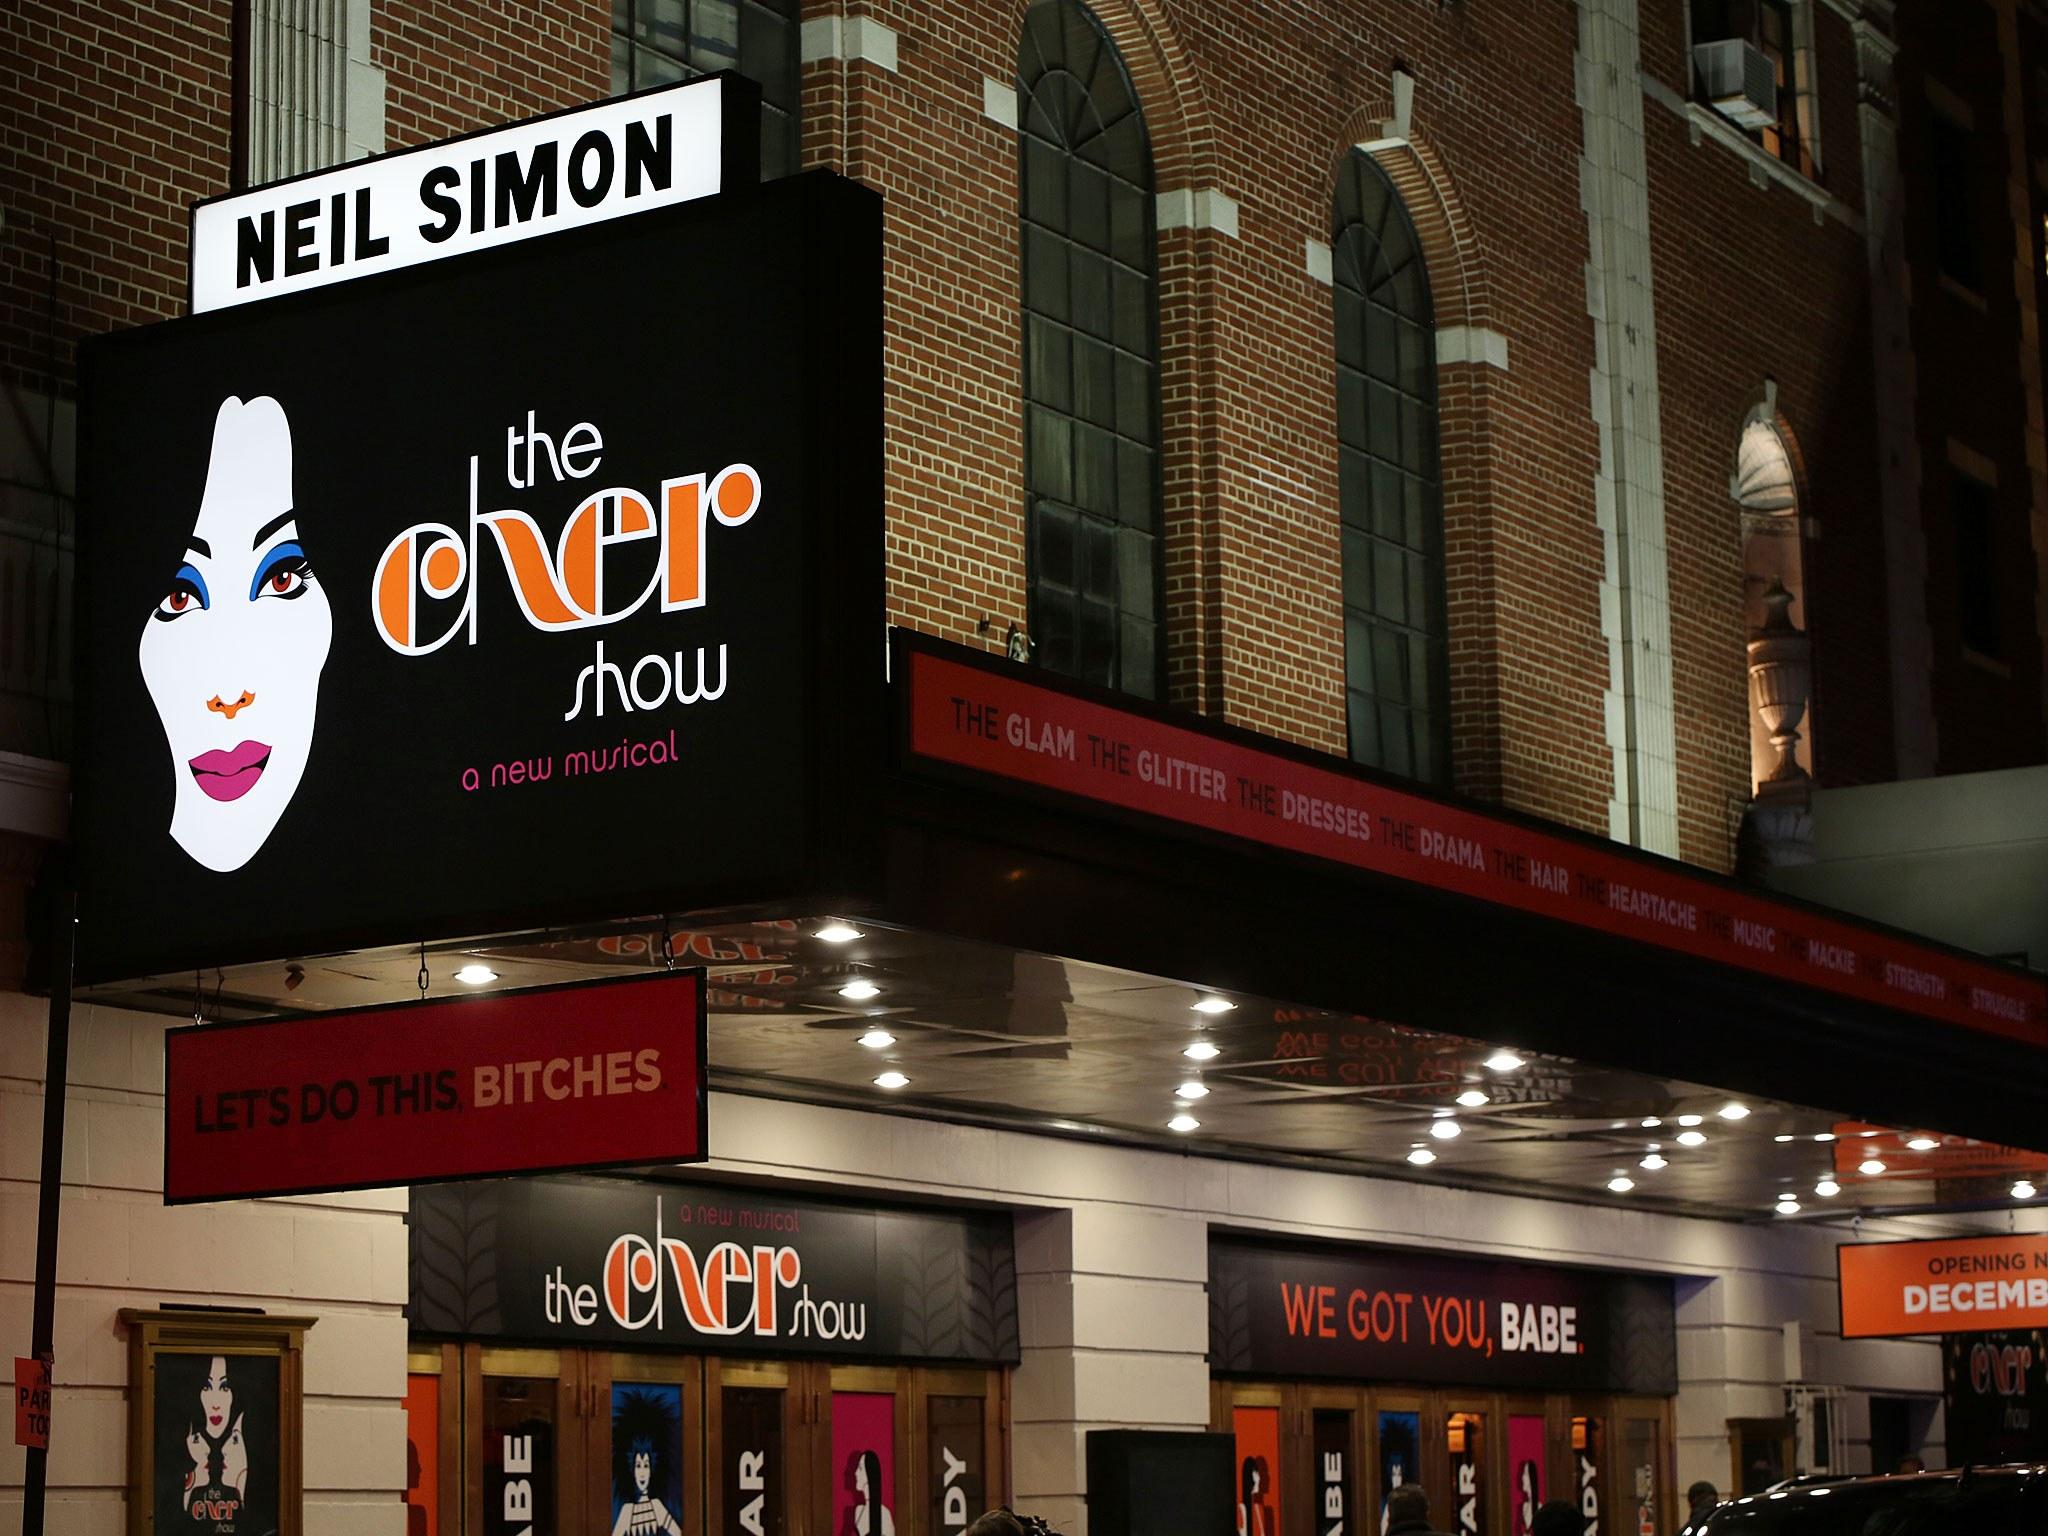 Neil Simon Theatre Marquee for The Cher Show